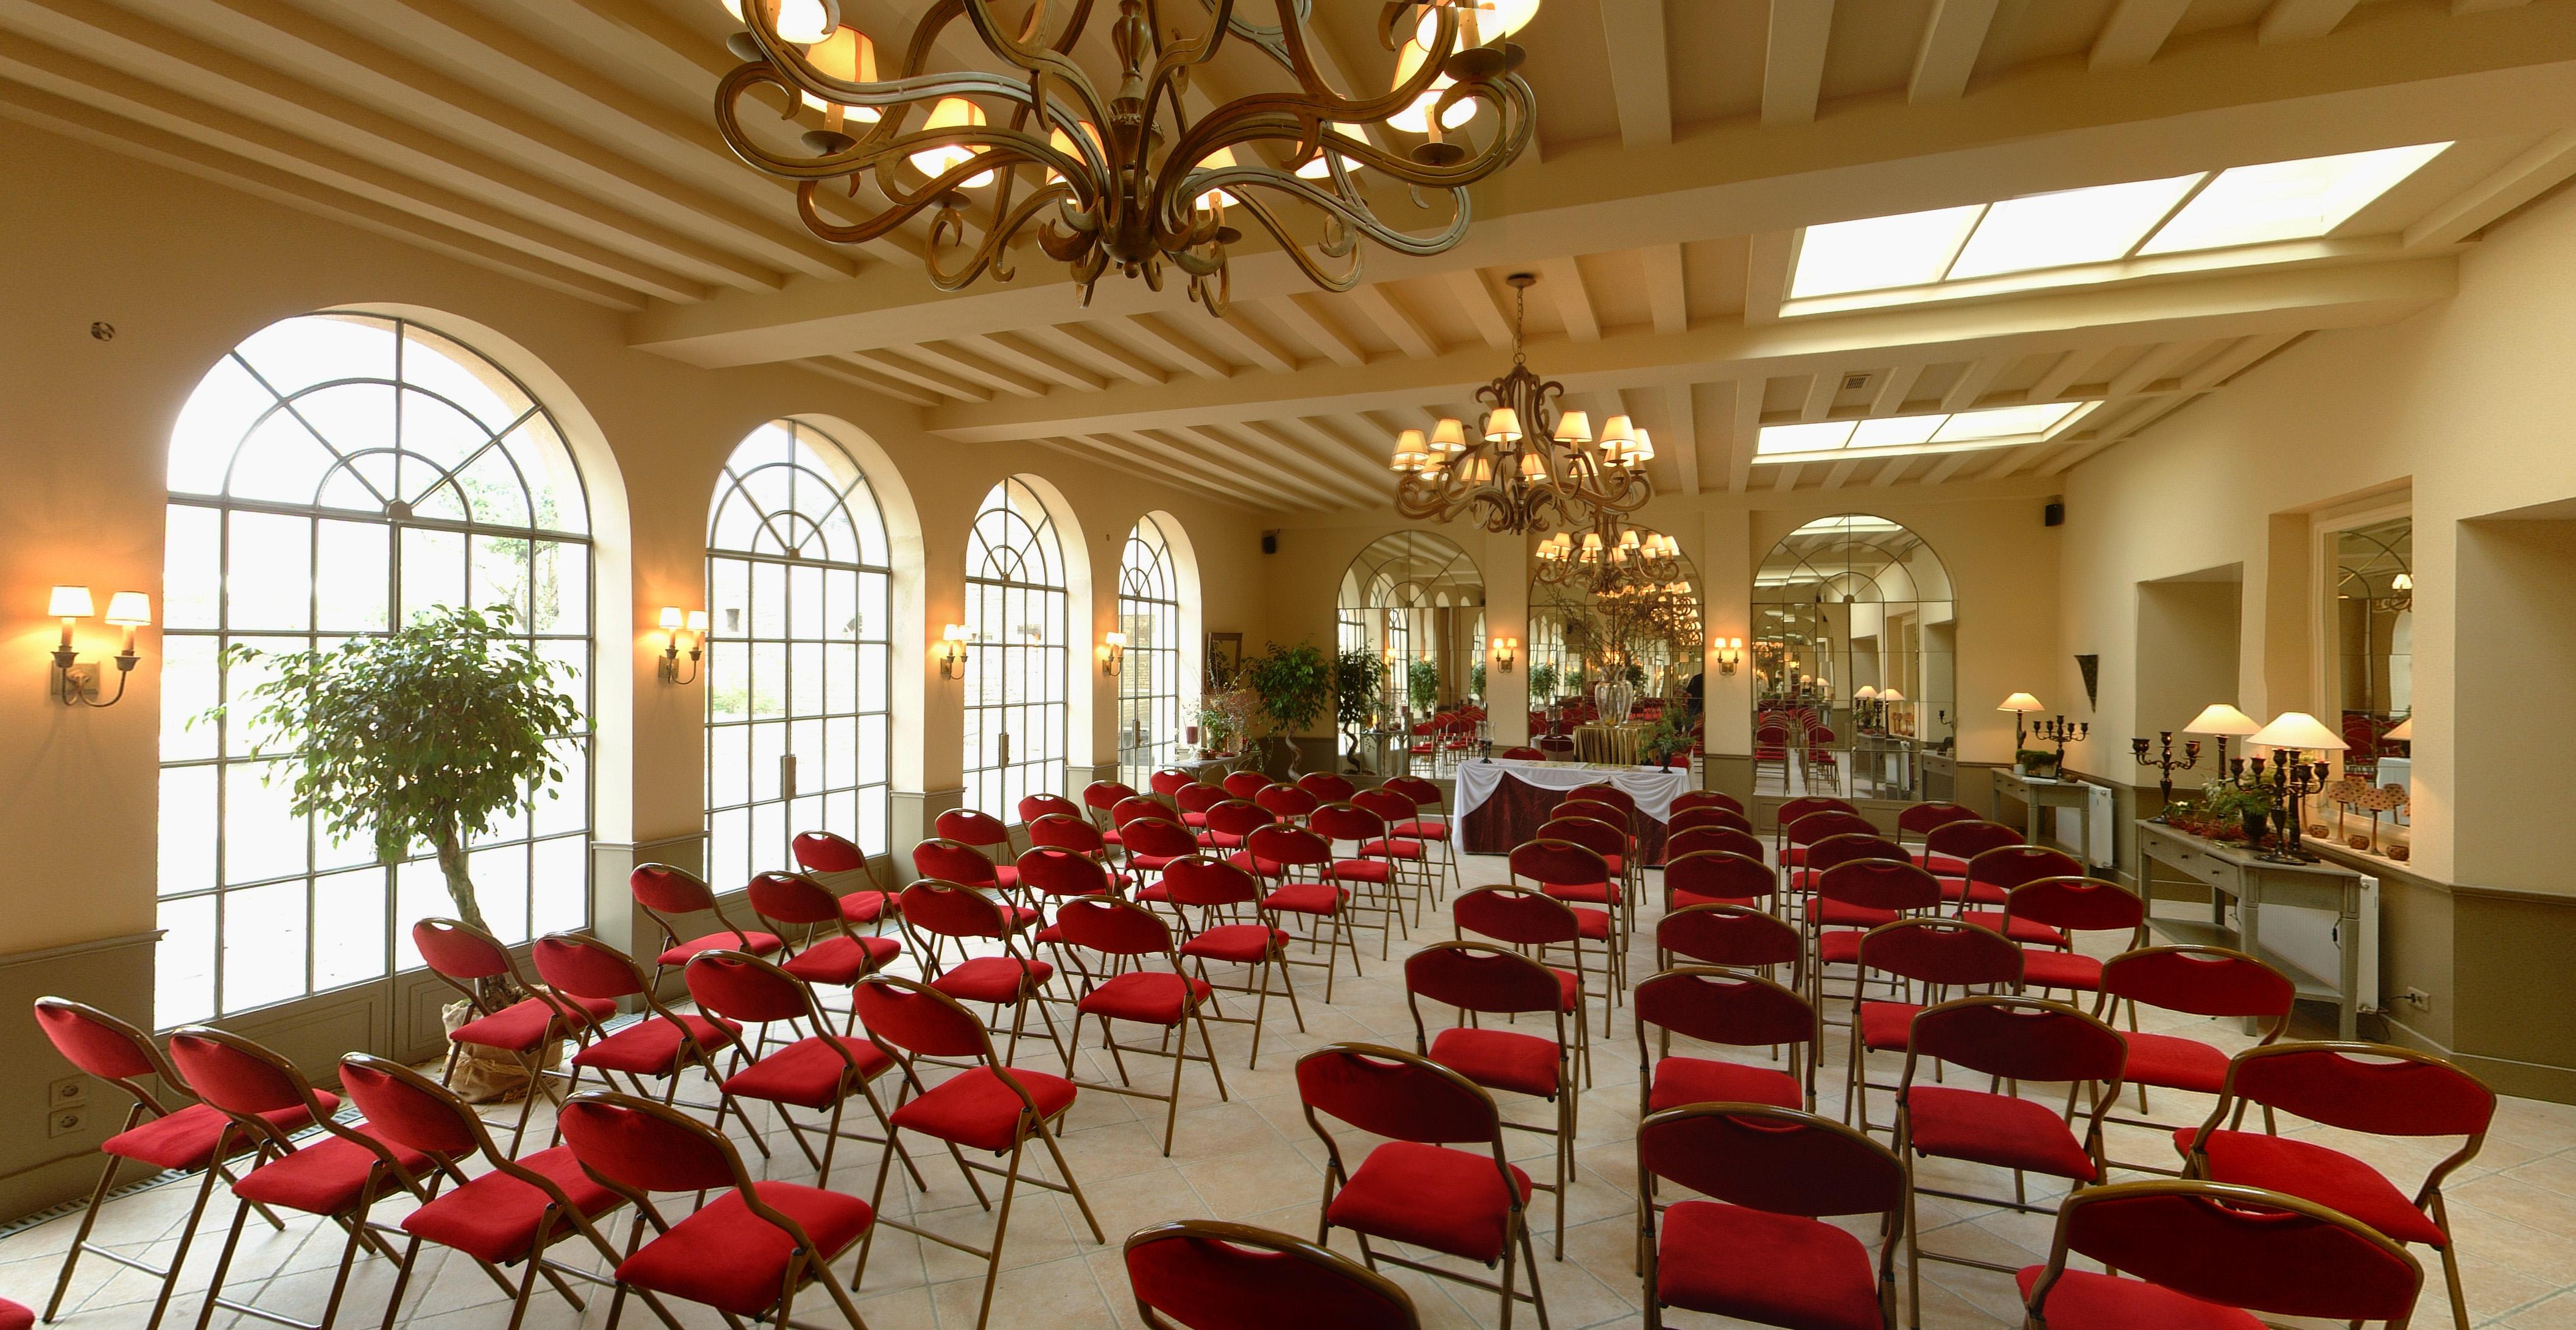 Image seminars